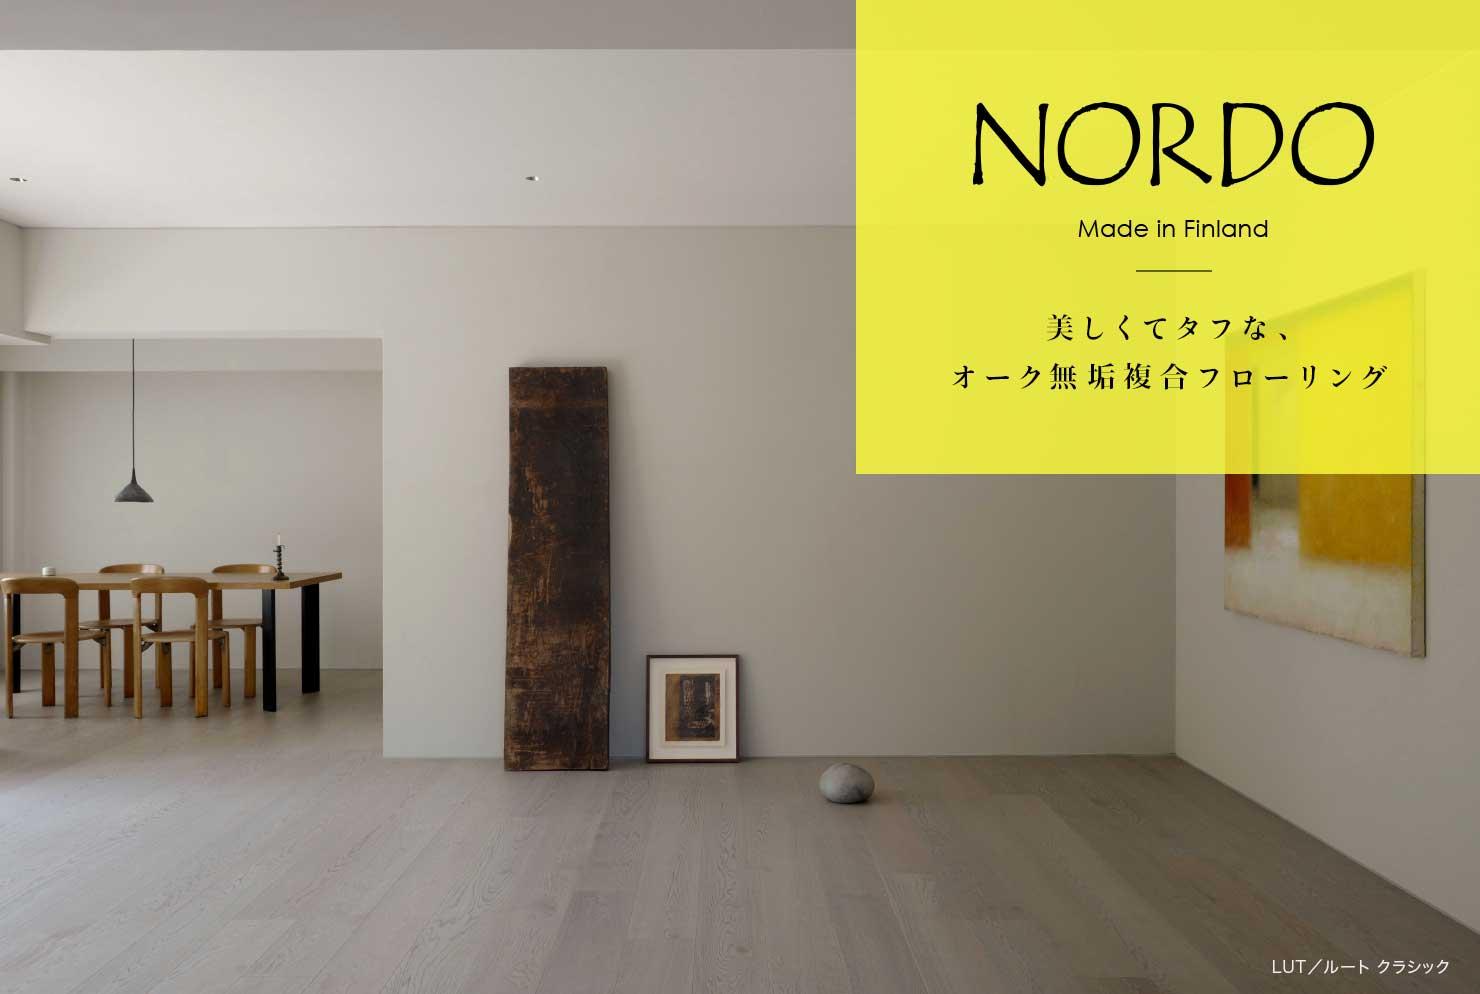 NORD ノルド Made in Finland 美しくてタフな、オーク無垢複合フローリング LUT/ルート クラシック